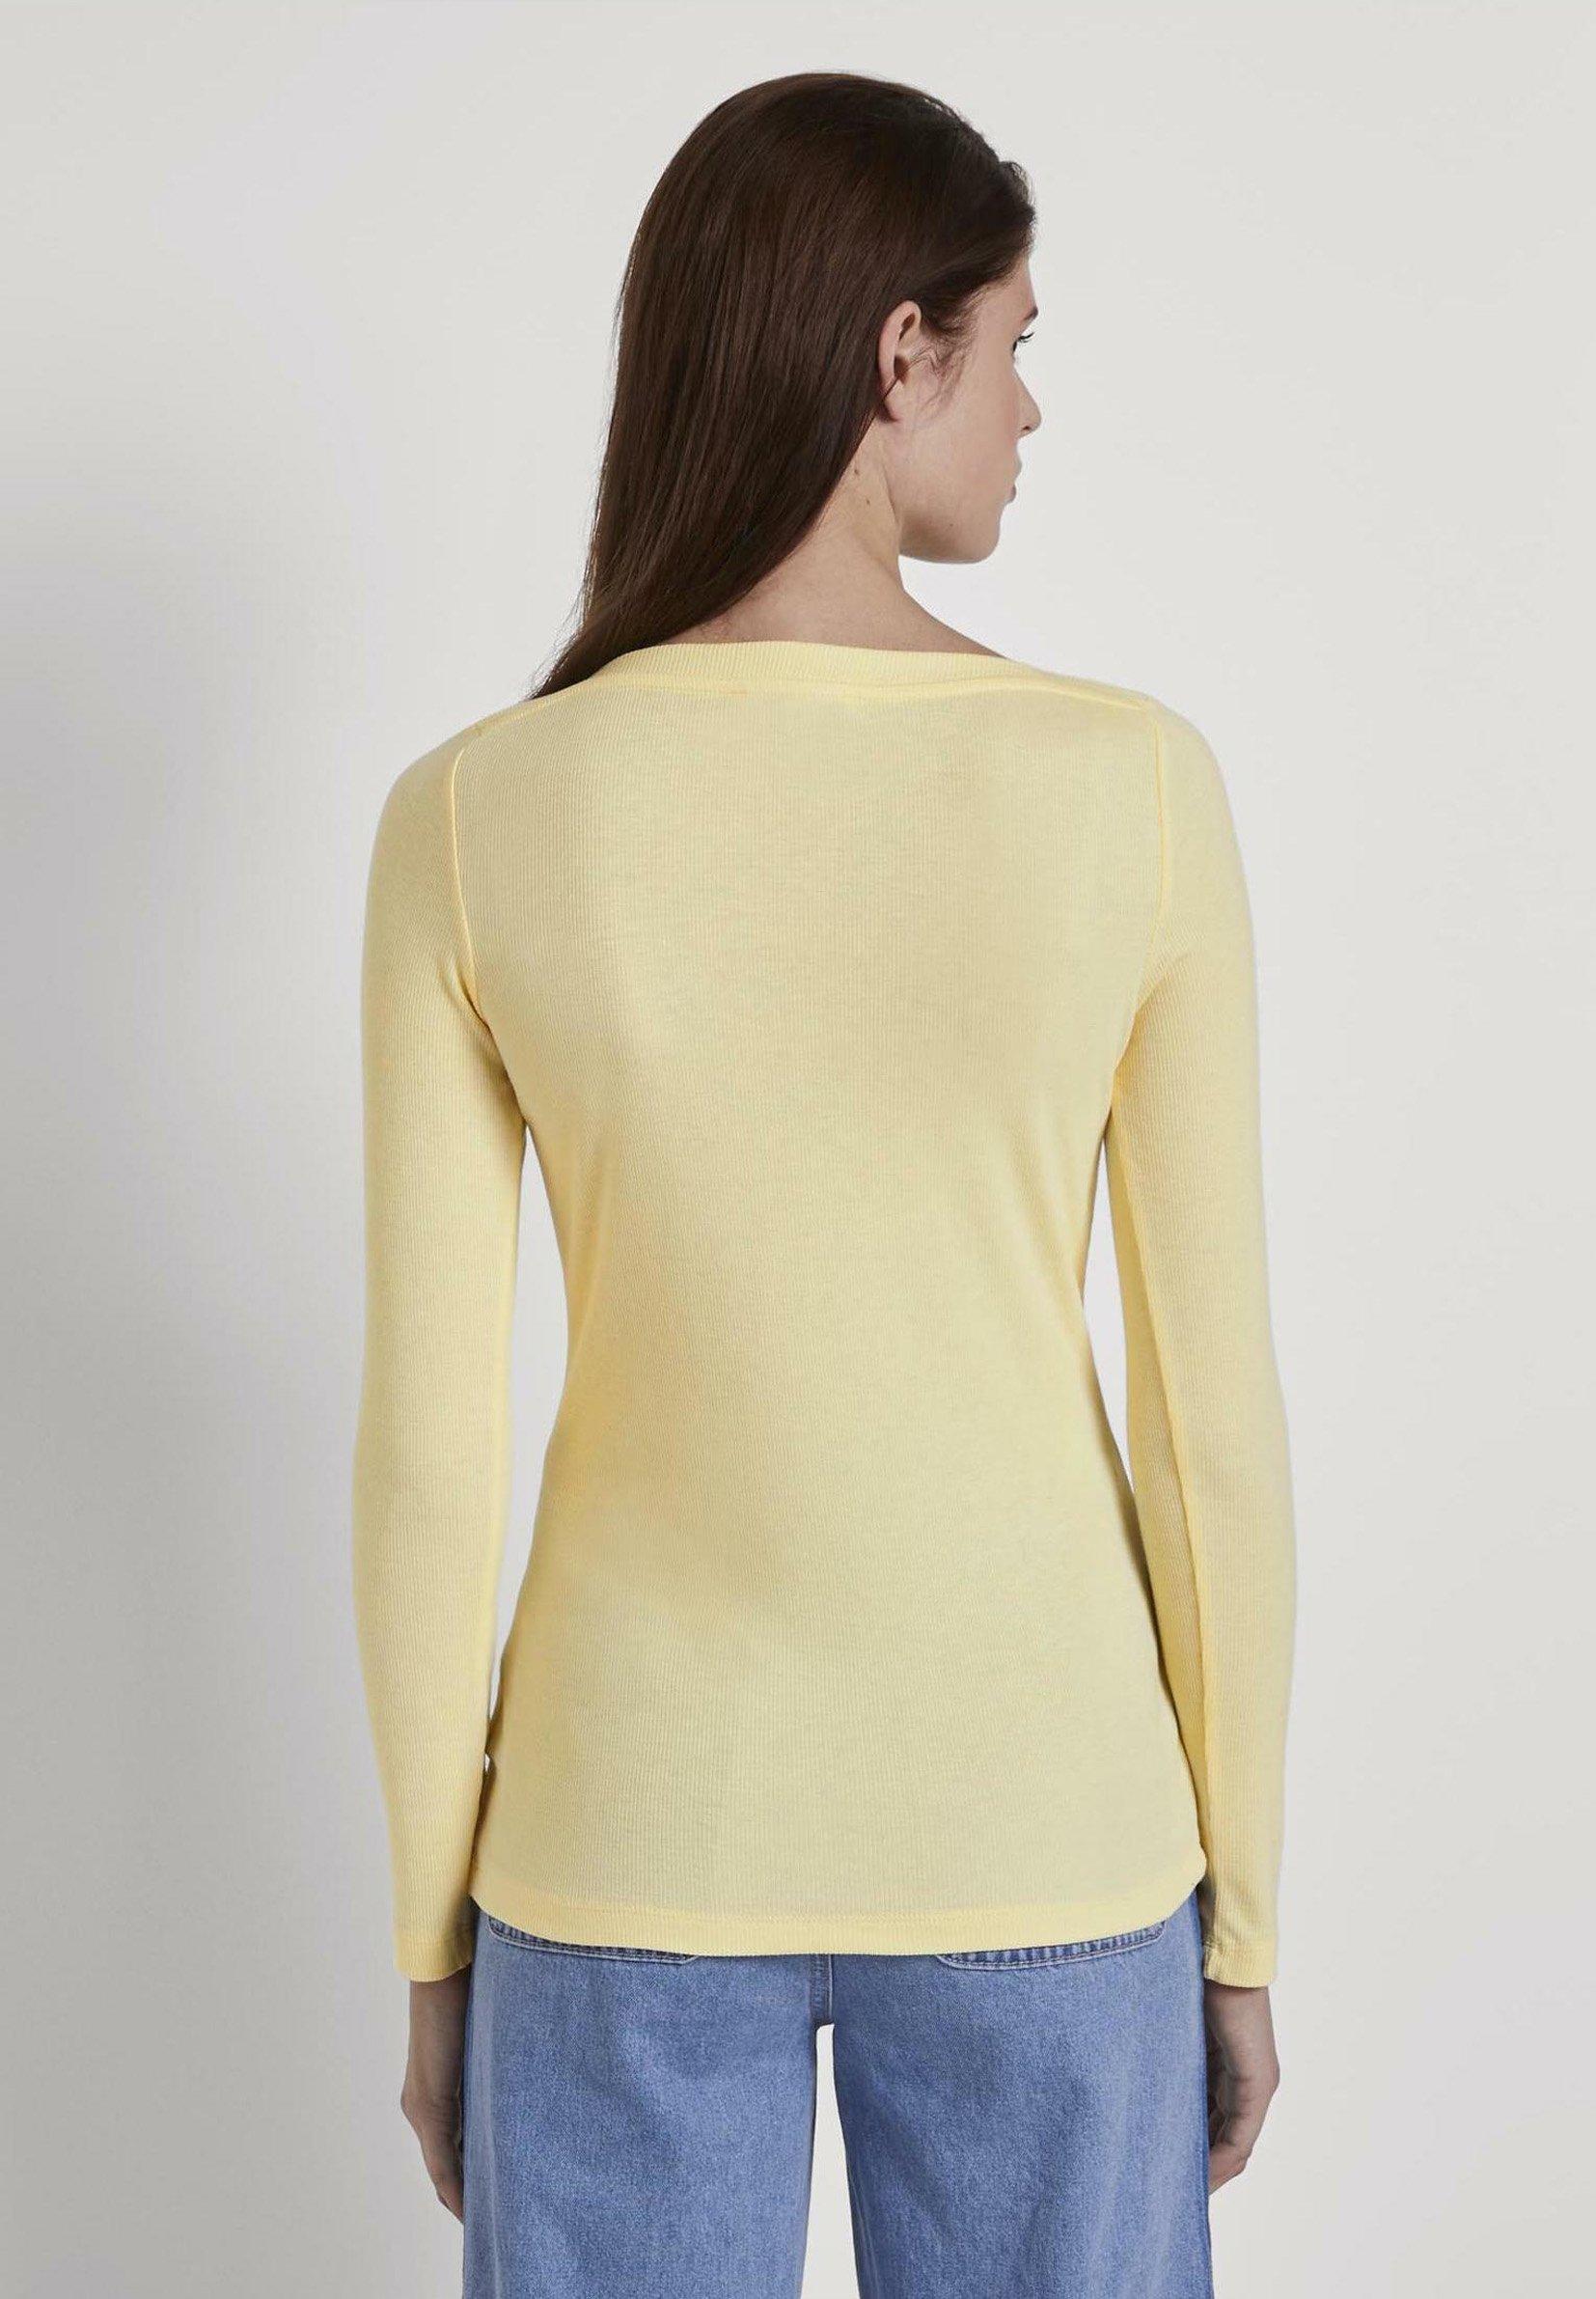 Tom Tailor Denim Basic - Long Sleeved Top Pale Yellow